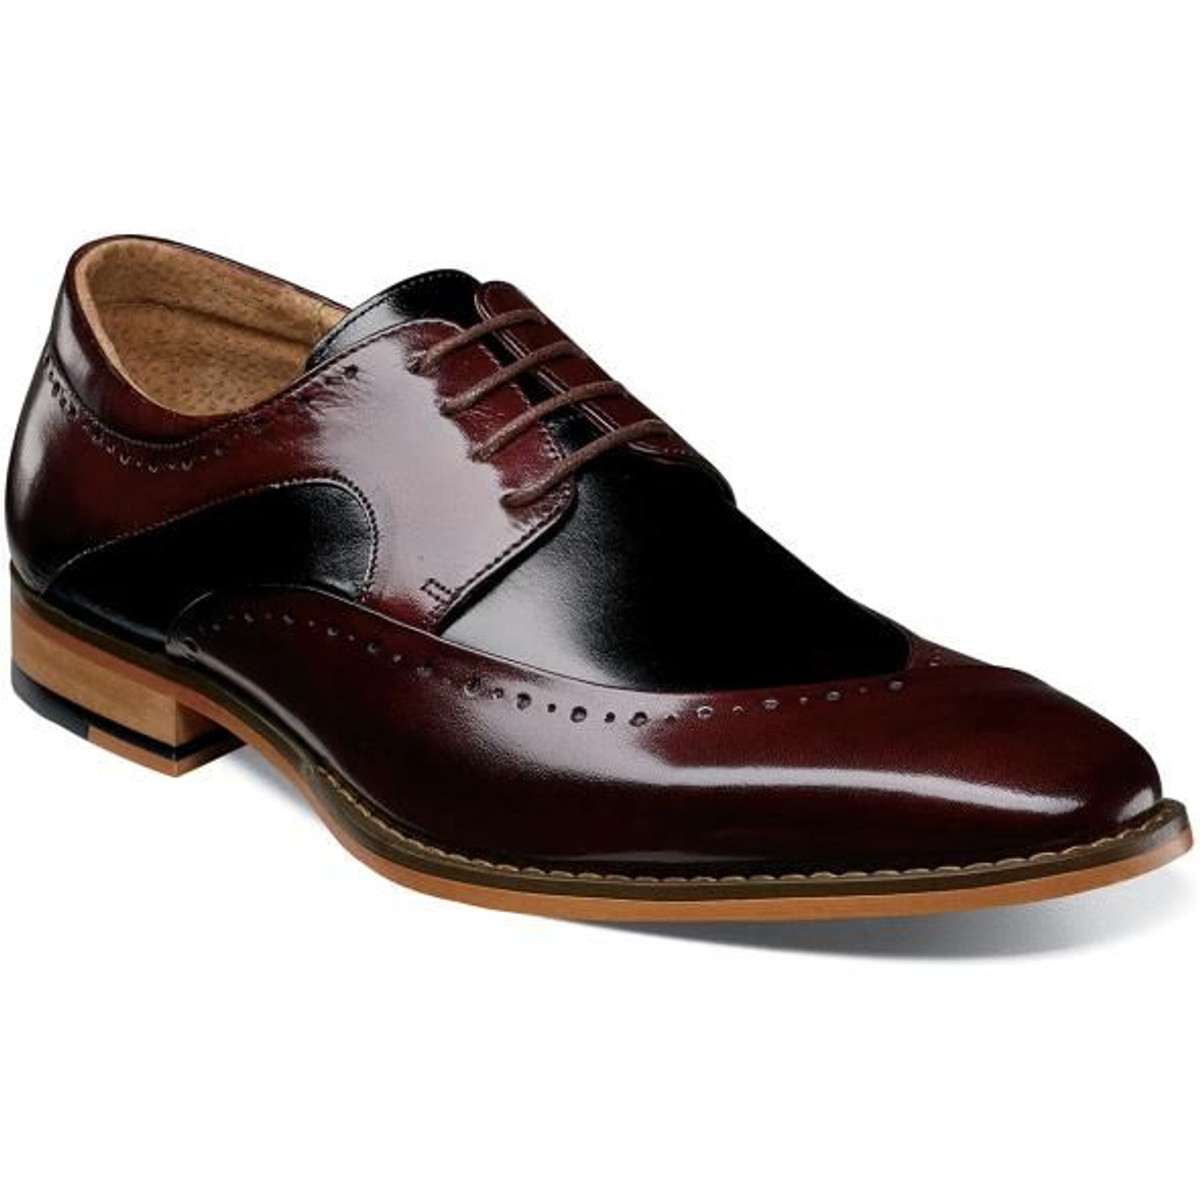 Stacy Adams Dress Shoes Burgundy Black Top 25292-641 IS